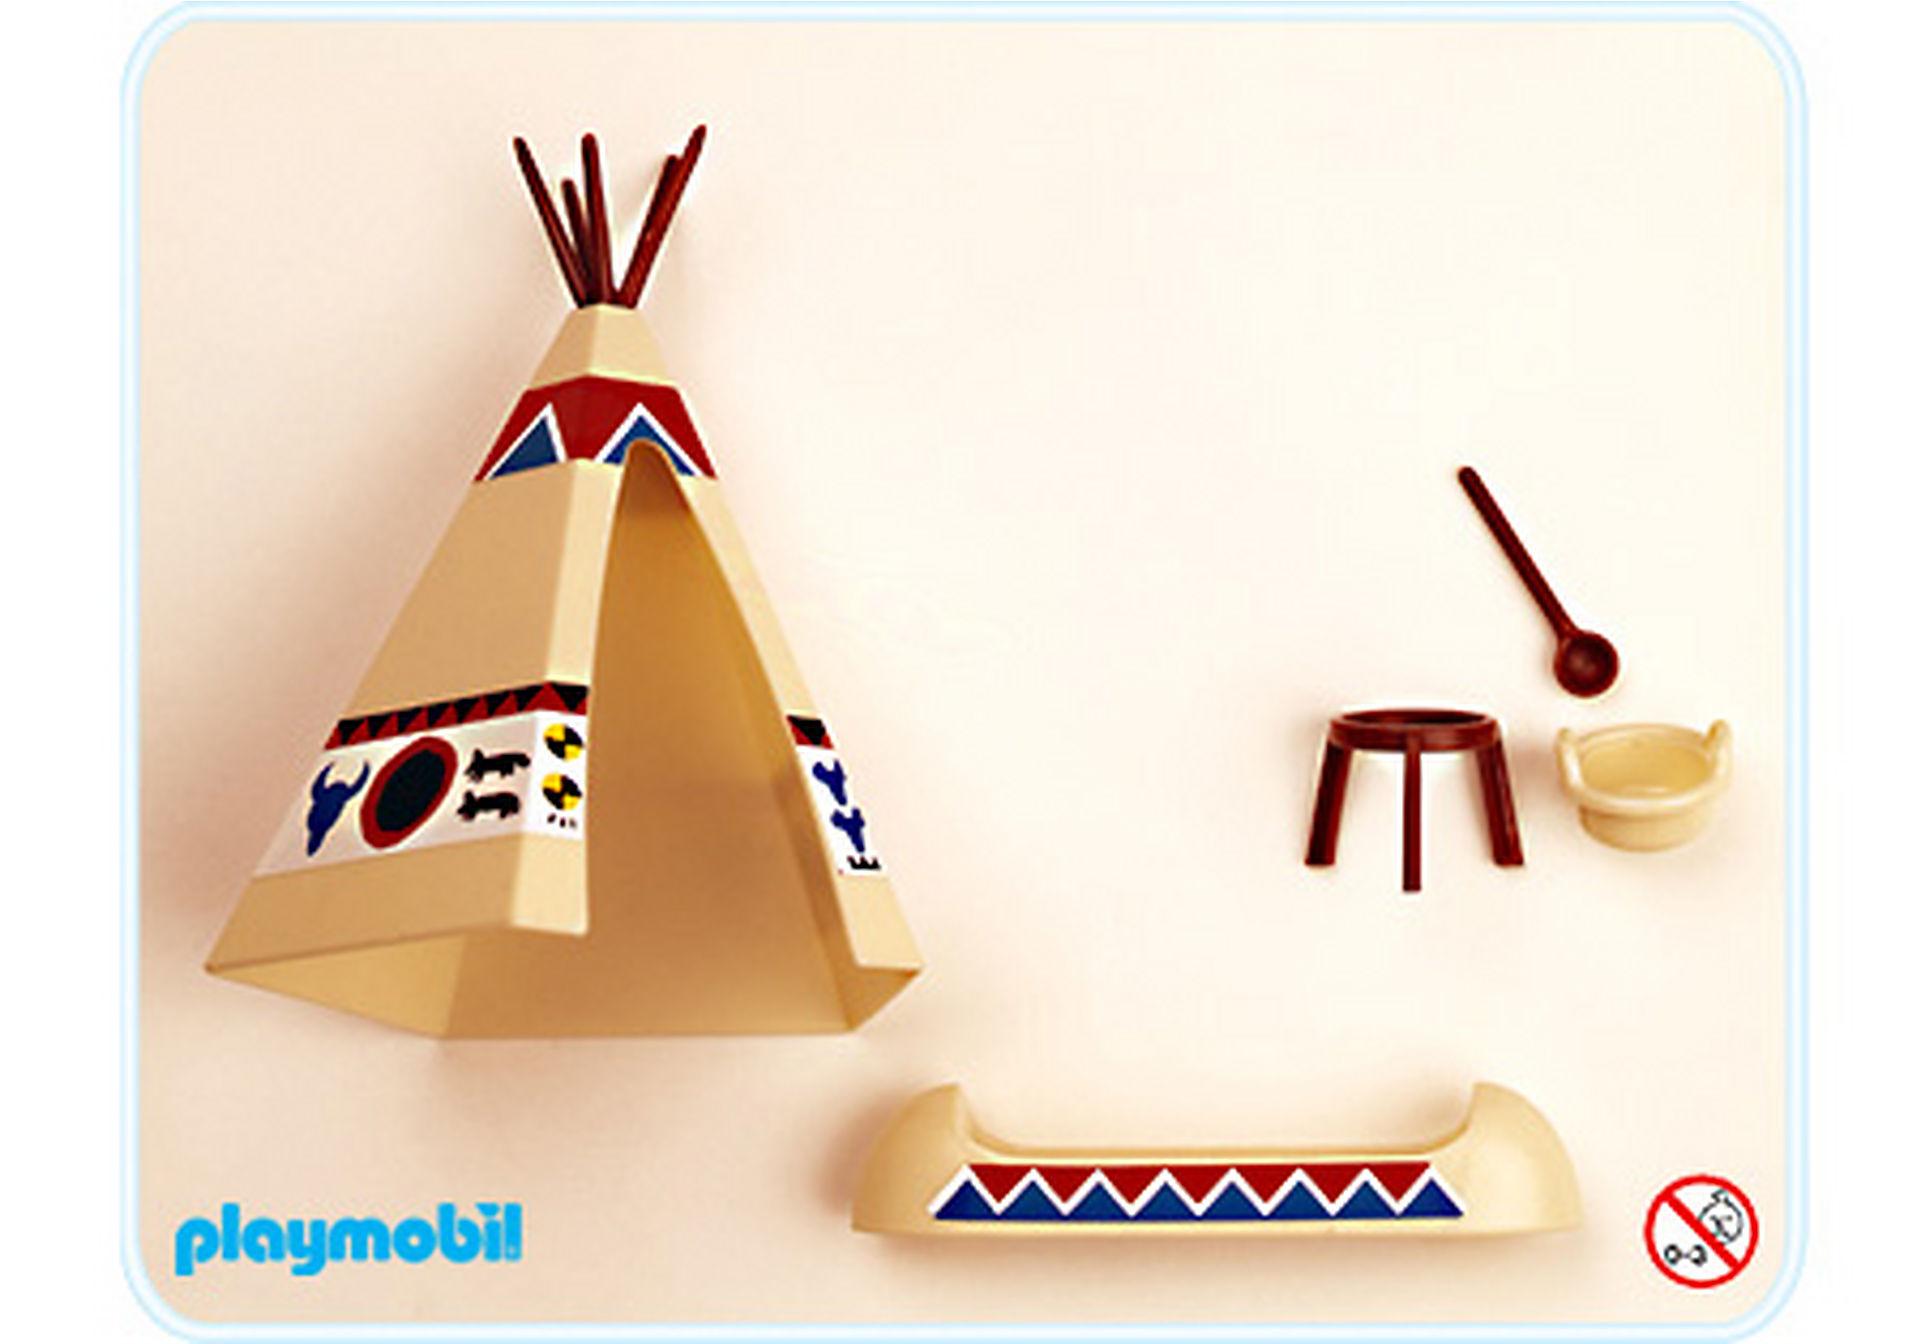 http://media.playmobil.com/i/playmobil/3121-A_product_detail/Indianer-Zubehör